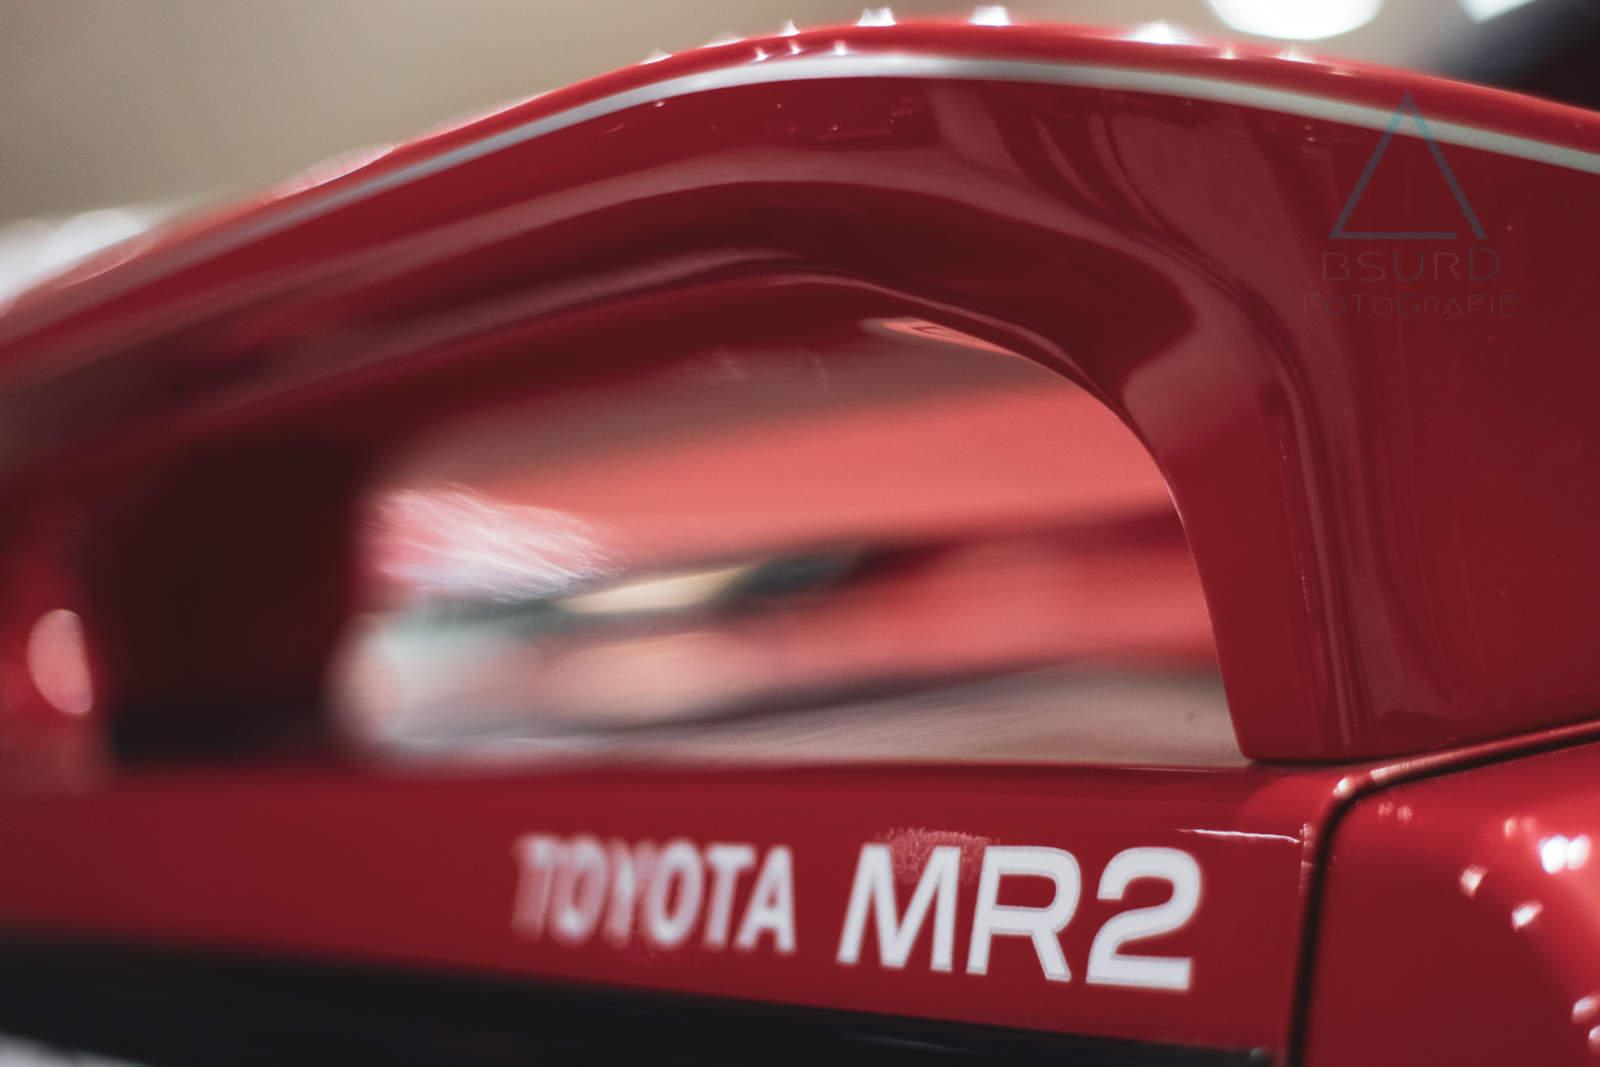 2019-01-05-Toyota-Collection-Koeln - DSC01759-edit-82.jpg